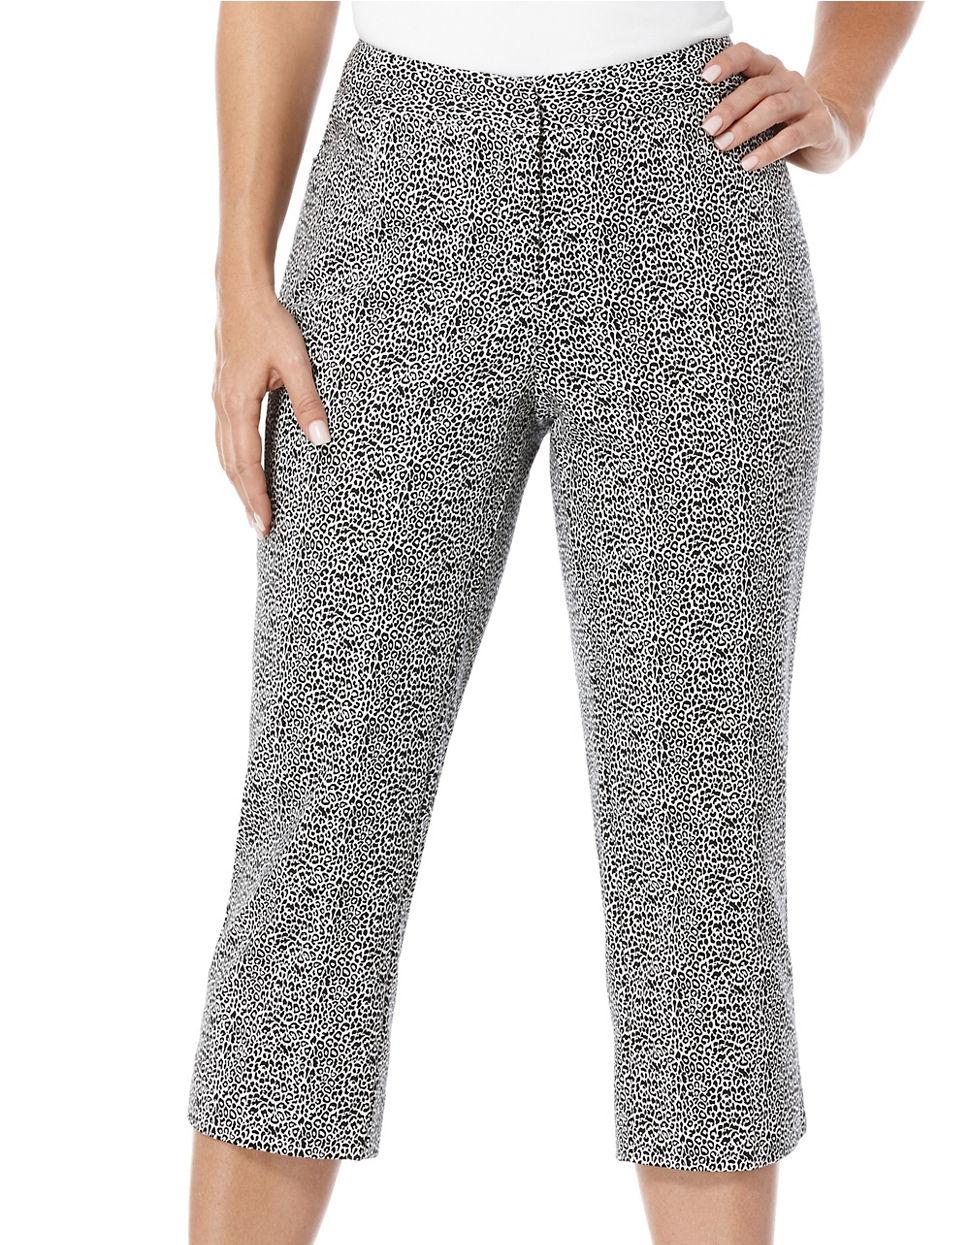 Rafaella Leopard Printed Power Stretch Capri Pants in Gray | Lyst